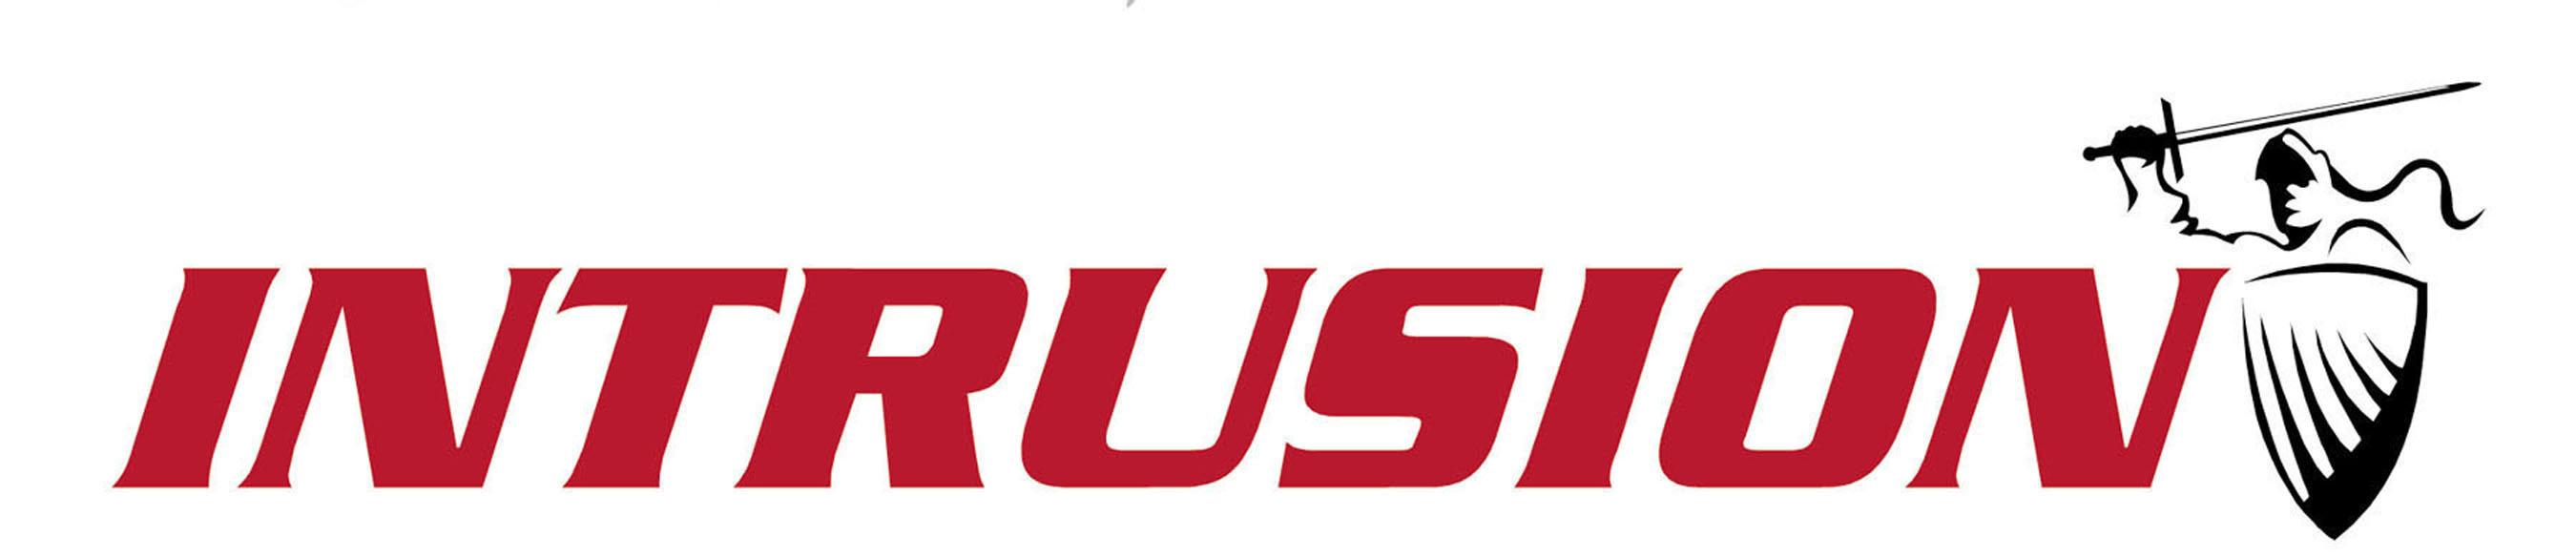 Intrusion Inc., logo.